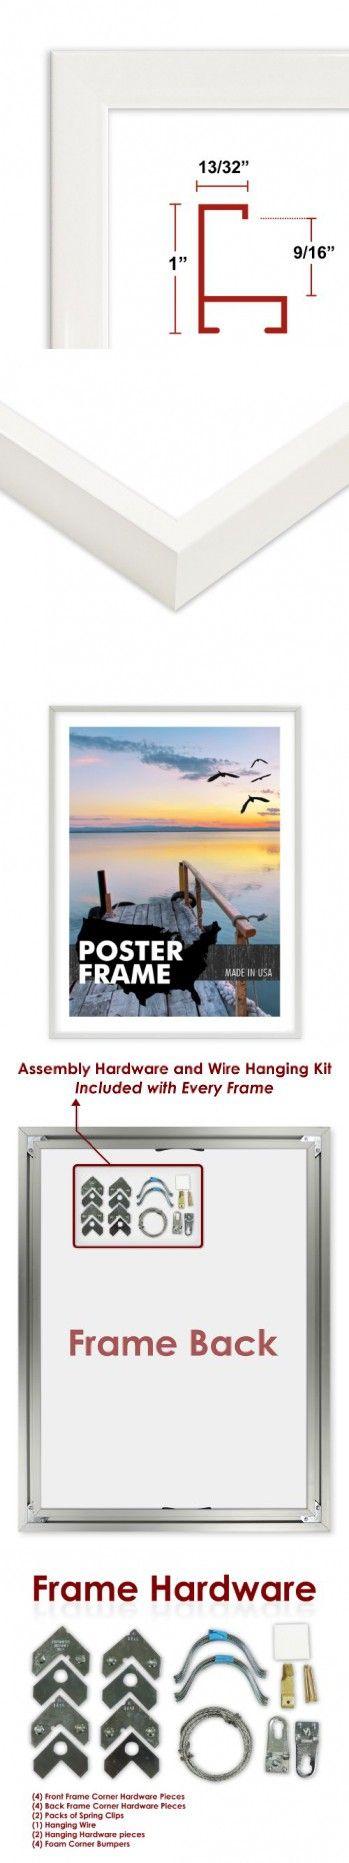 25 x 38 poster frame profile 93